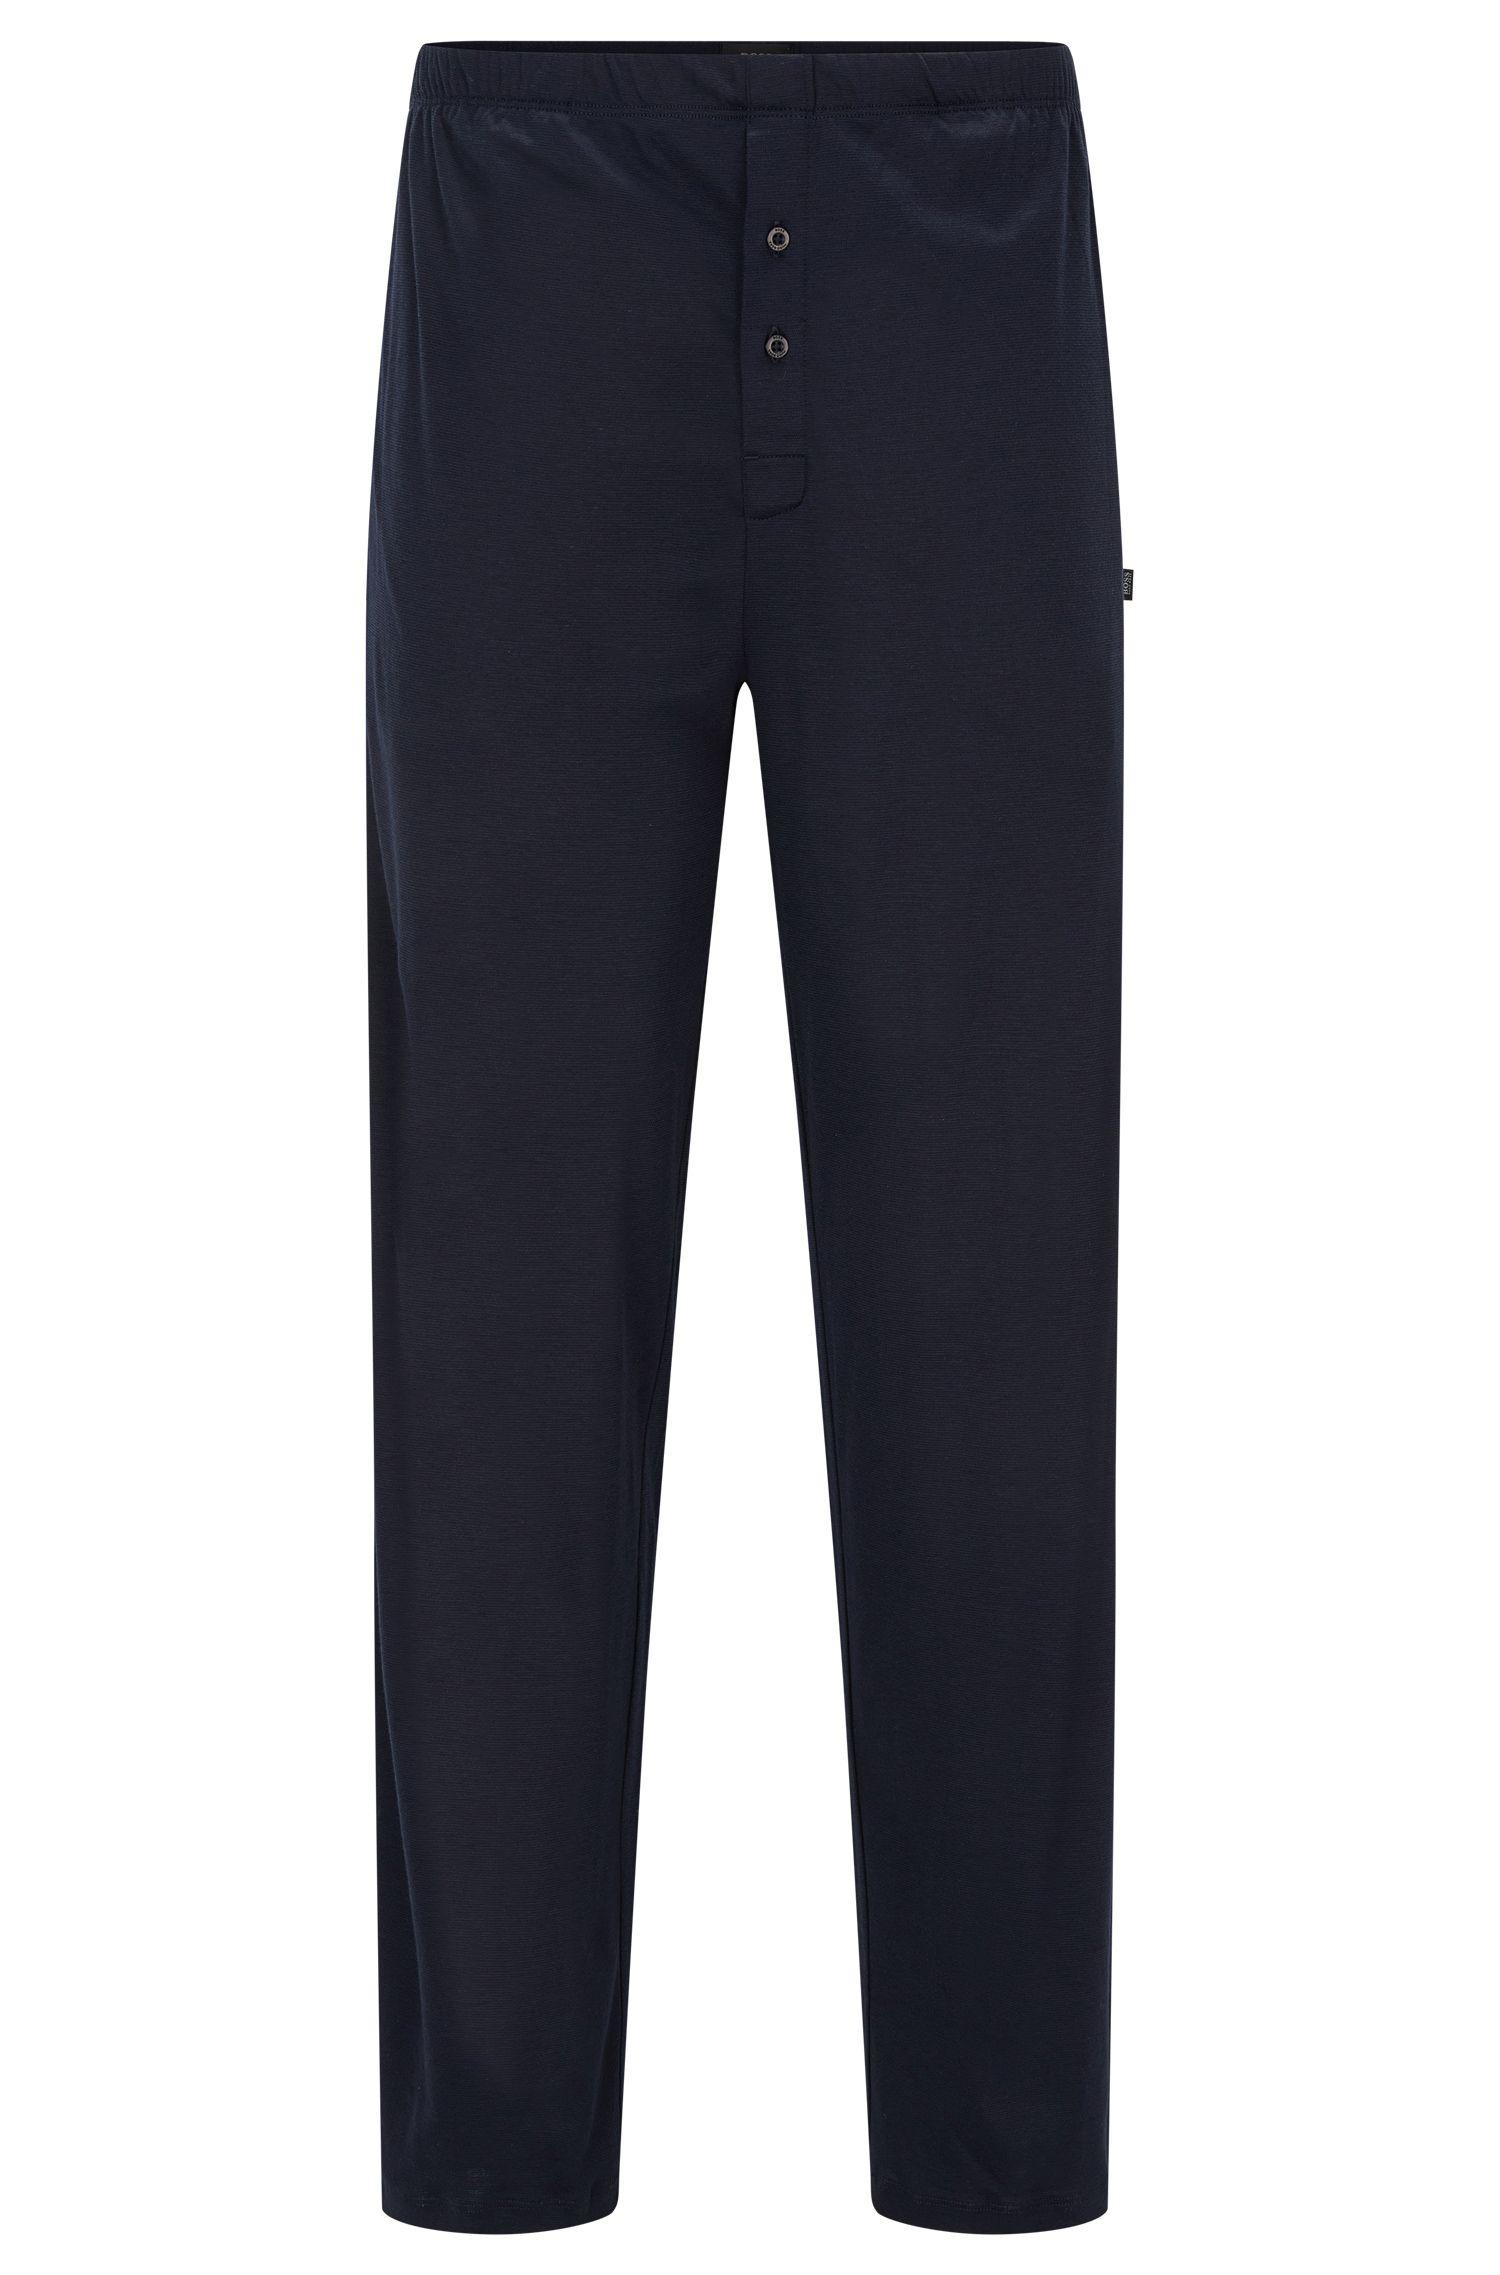 Stretch Cotton Pant | Long Pant CW